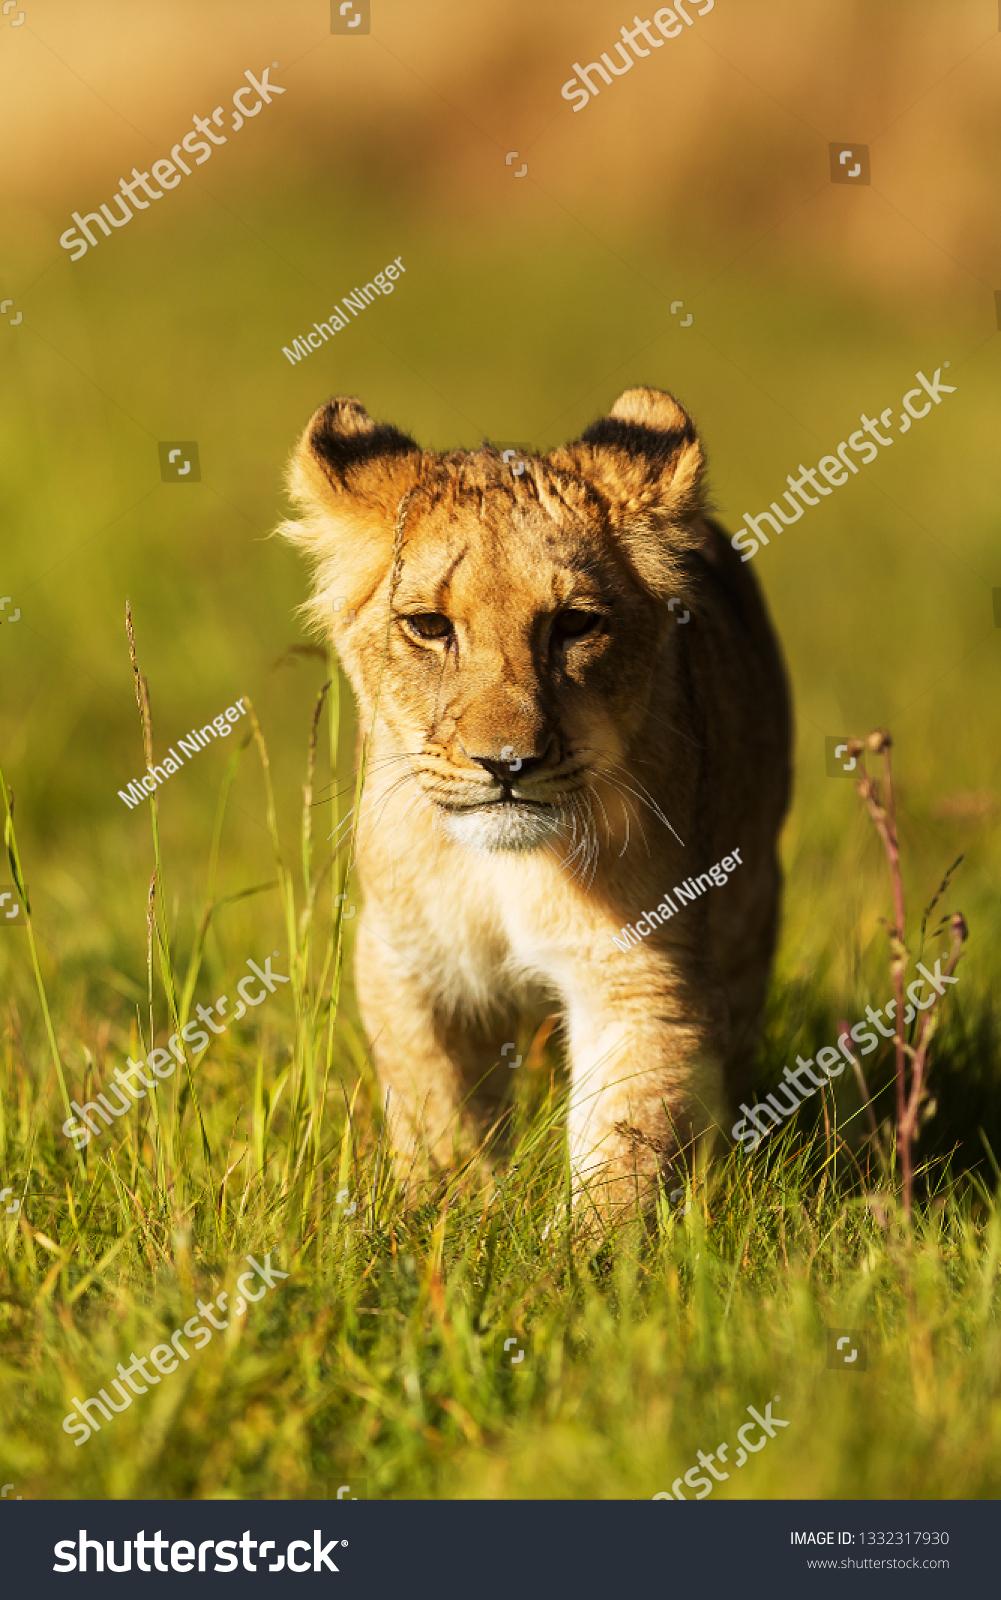 young lioness (Panthera leo) close up portrait